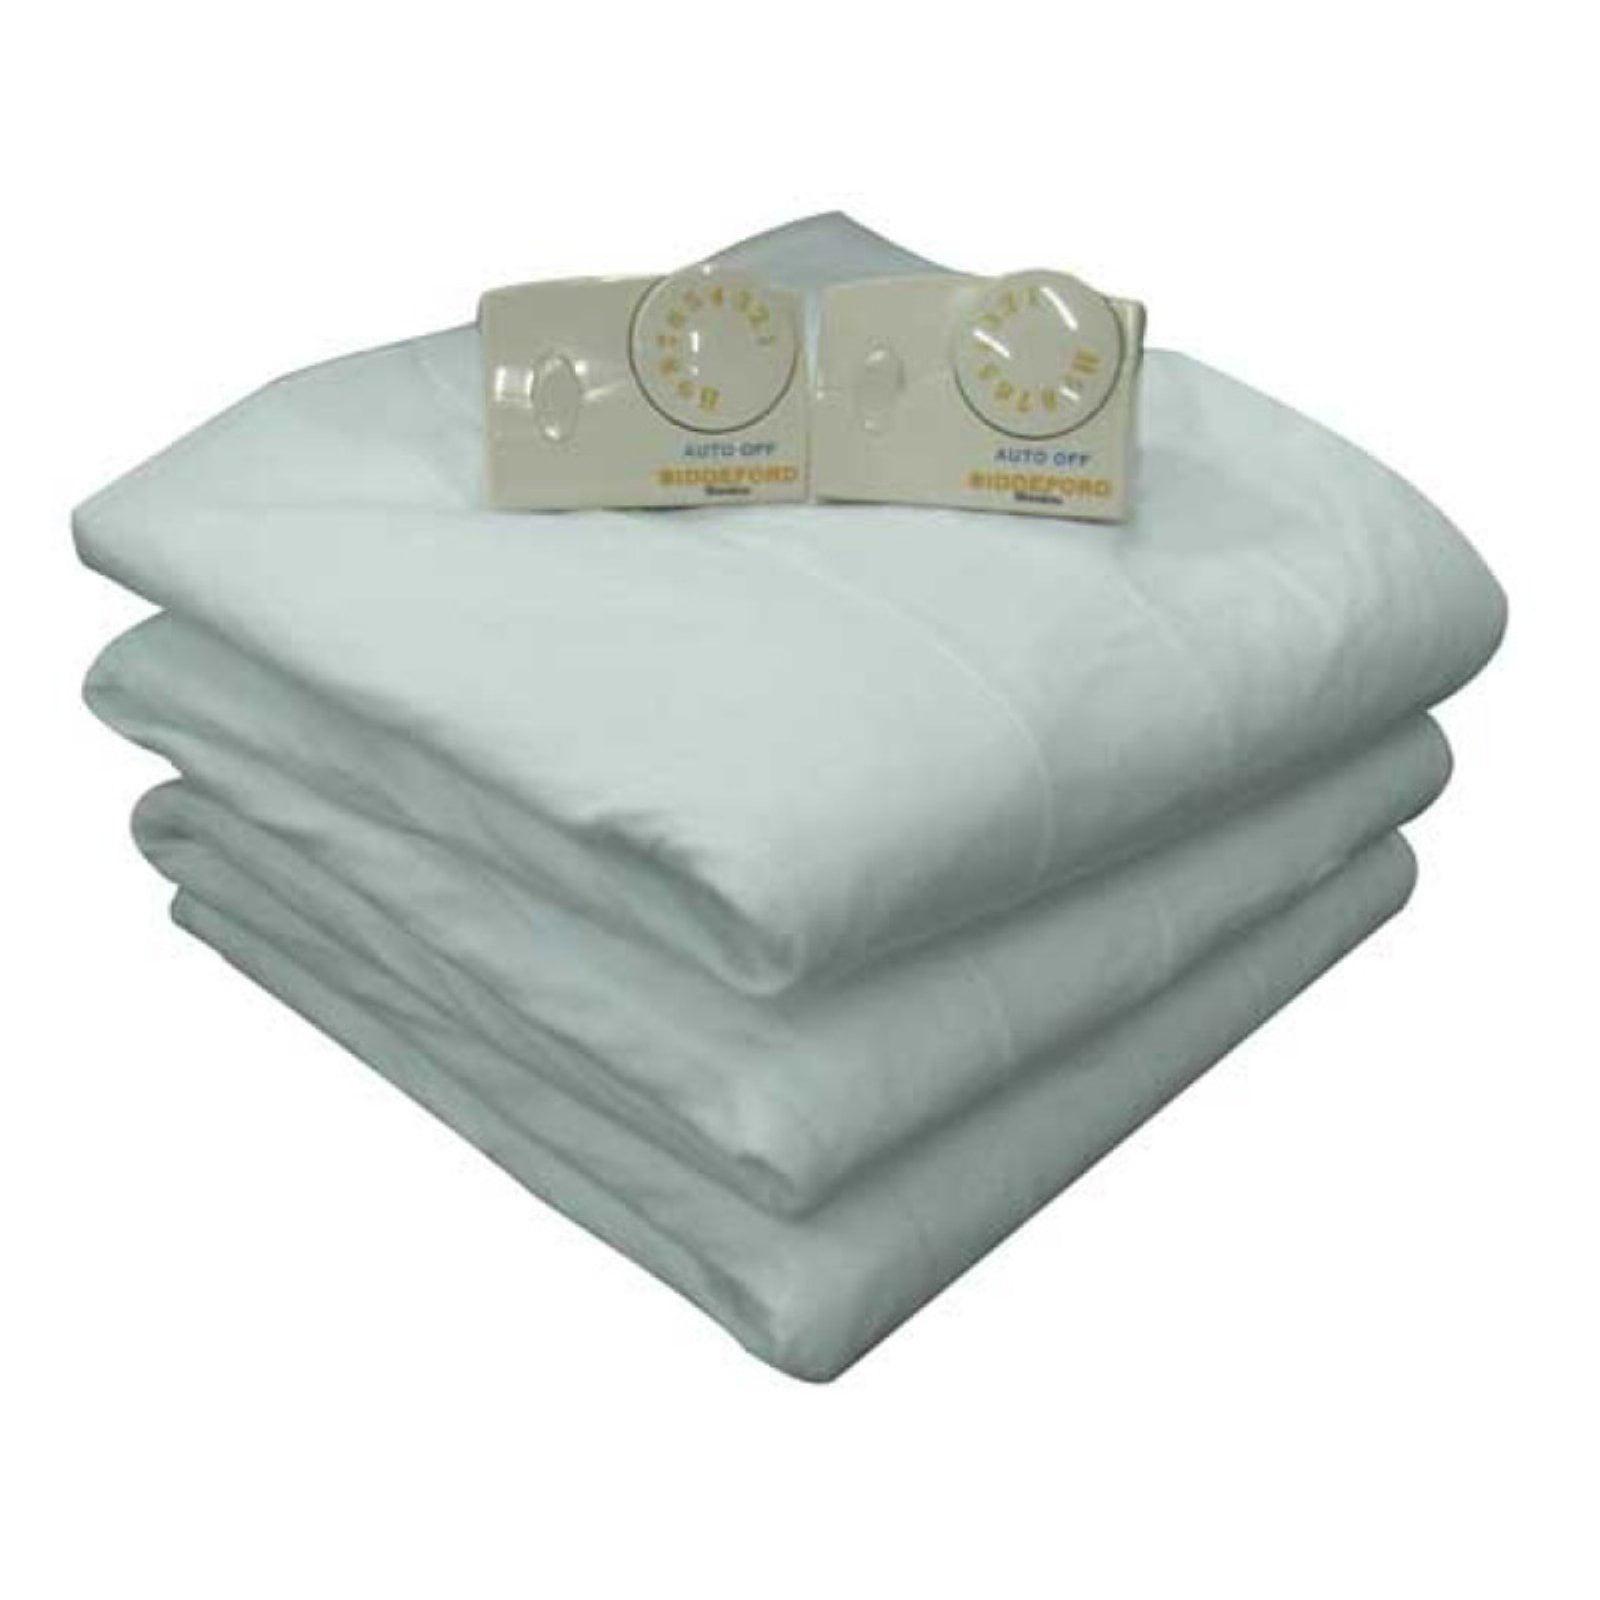 biddeford blankets electric heated mattress pad - Heated Mattress Pad Queen